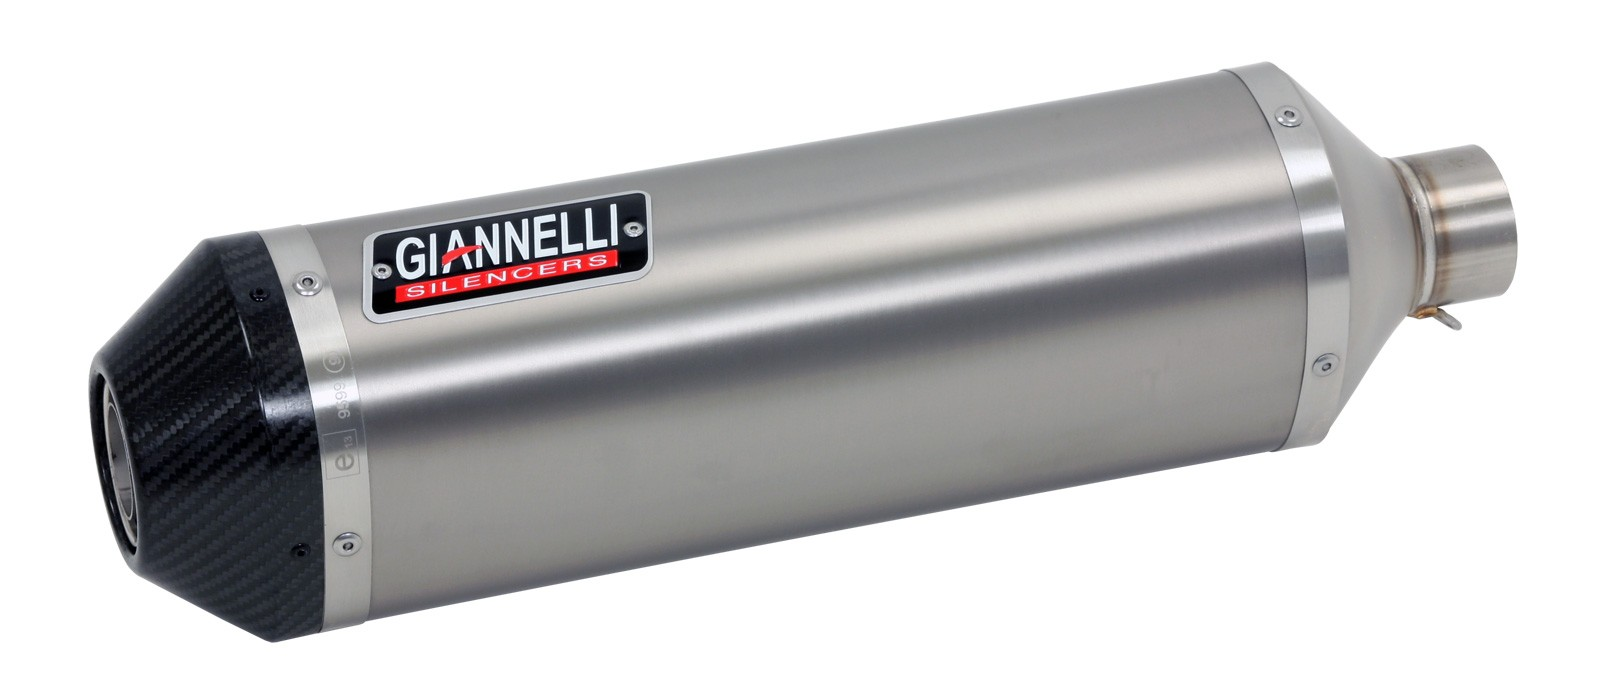 ESCAPES GIANNELLI YAMAHA - Sistema completo IPERSPORT Silenciador aluminio Yamaha YZF-R 125 Giannelli 73815A6K -